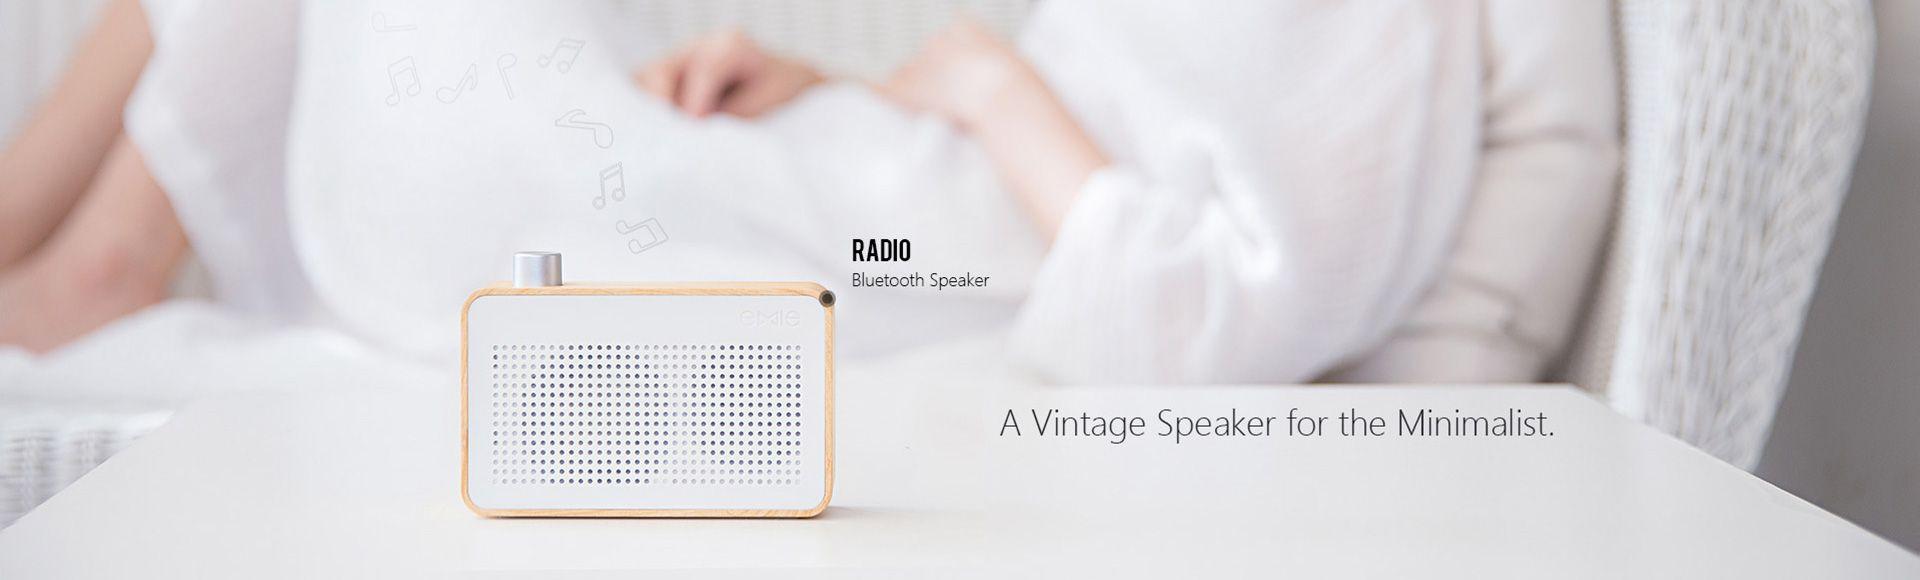 EMIE Radio Bluetooth Speaker - Radio-designed Home Speaker with Super Bass , Works with Apple iPhone , iPad , Samsung and More